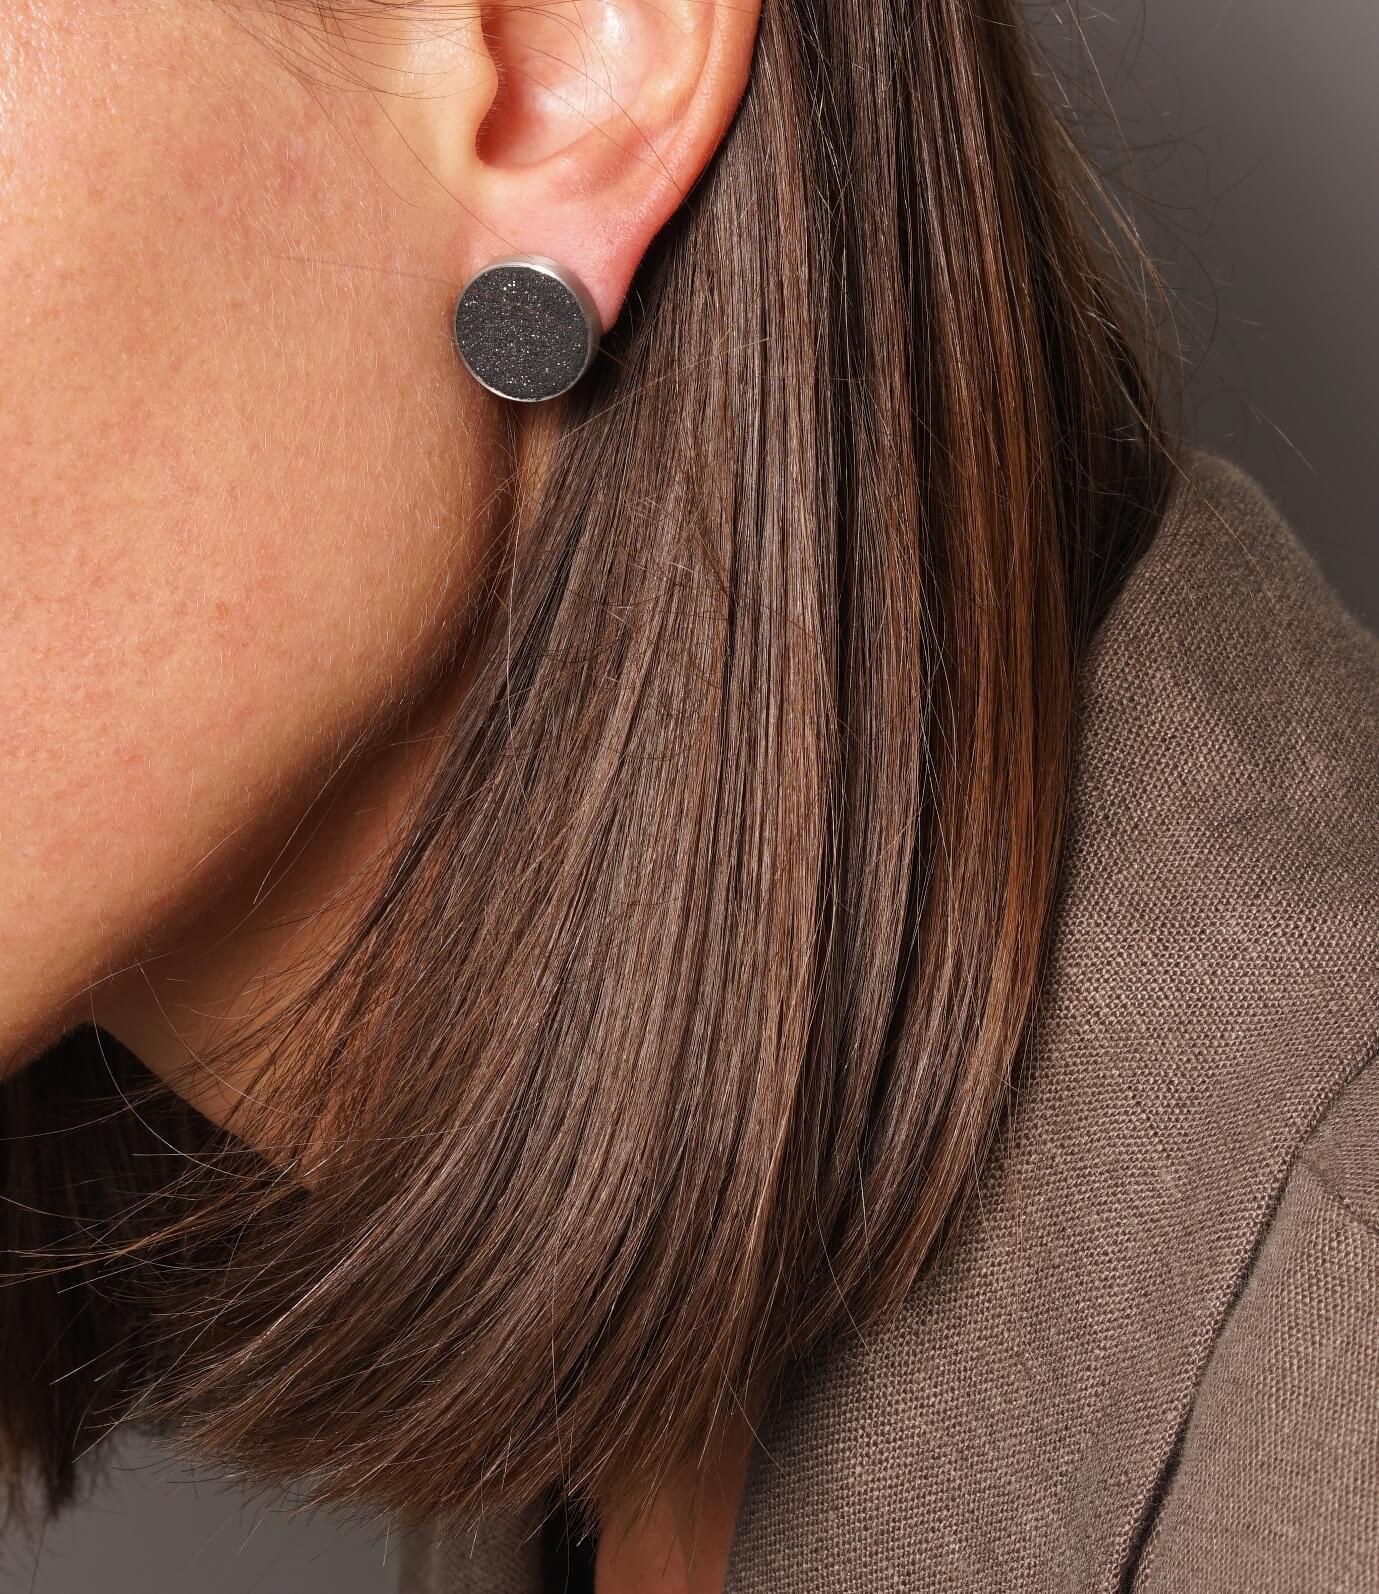 Konzuk Adhara Stud Earrings — серьги из бетона и стали